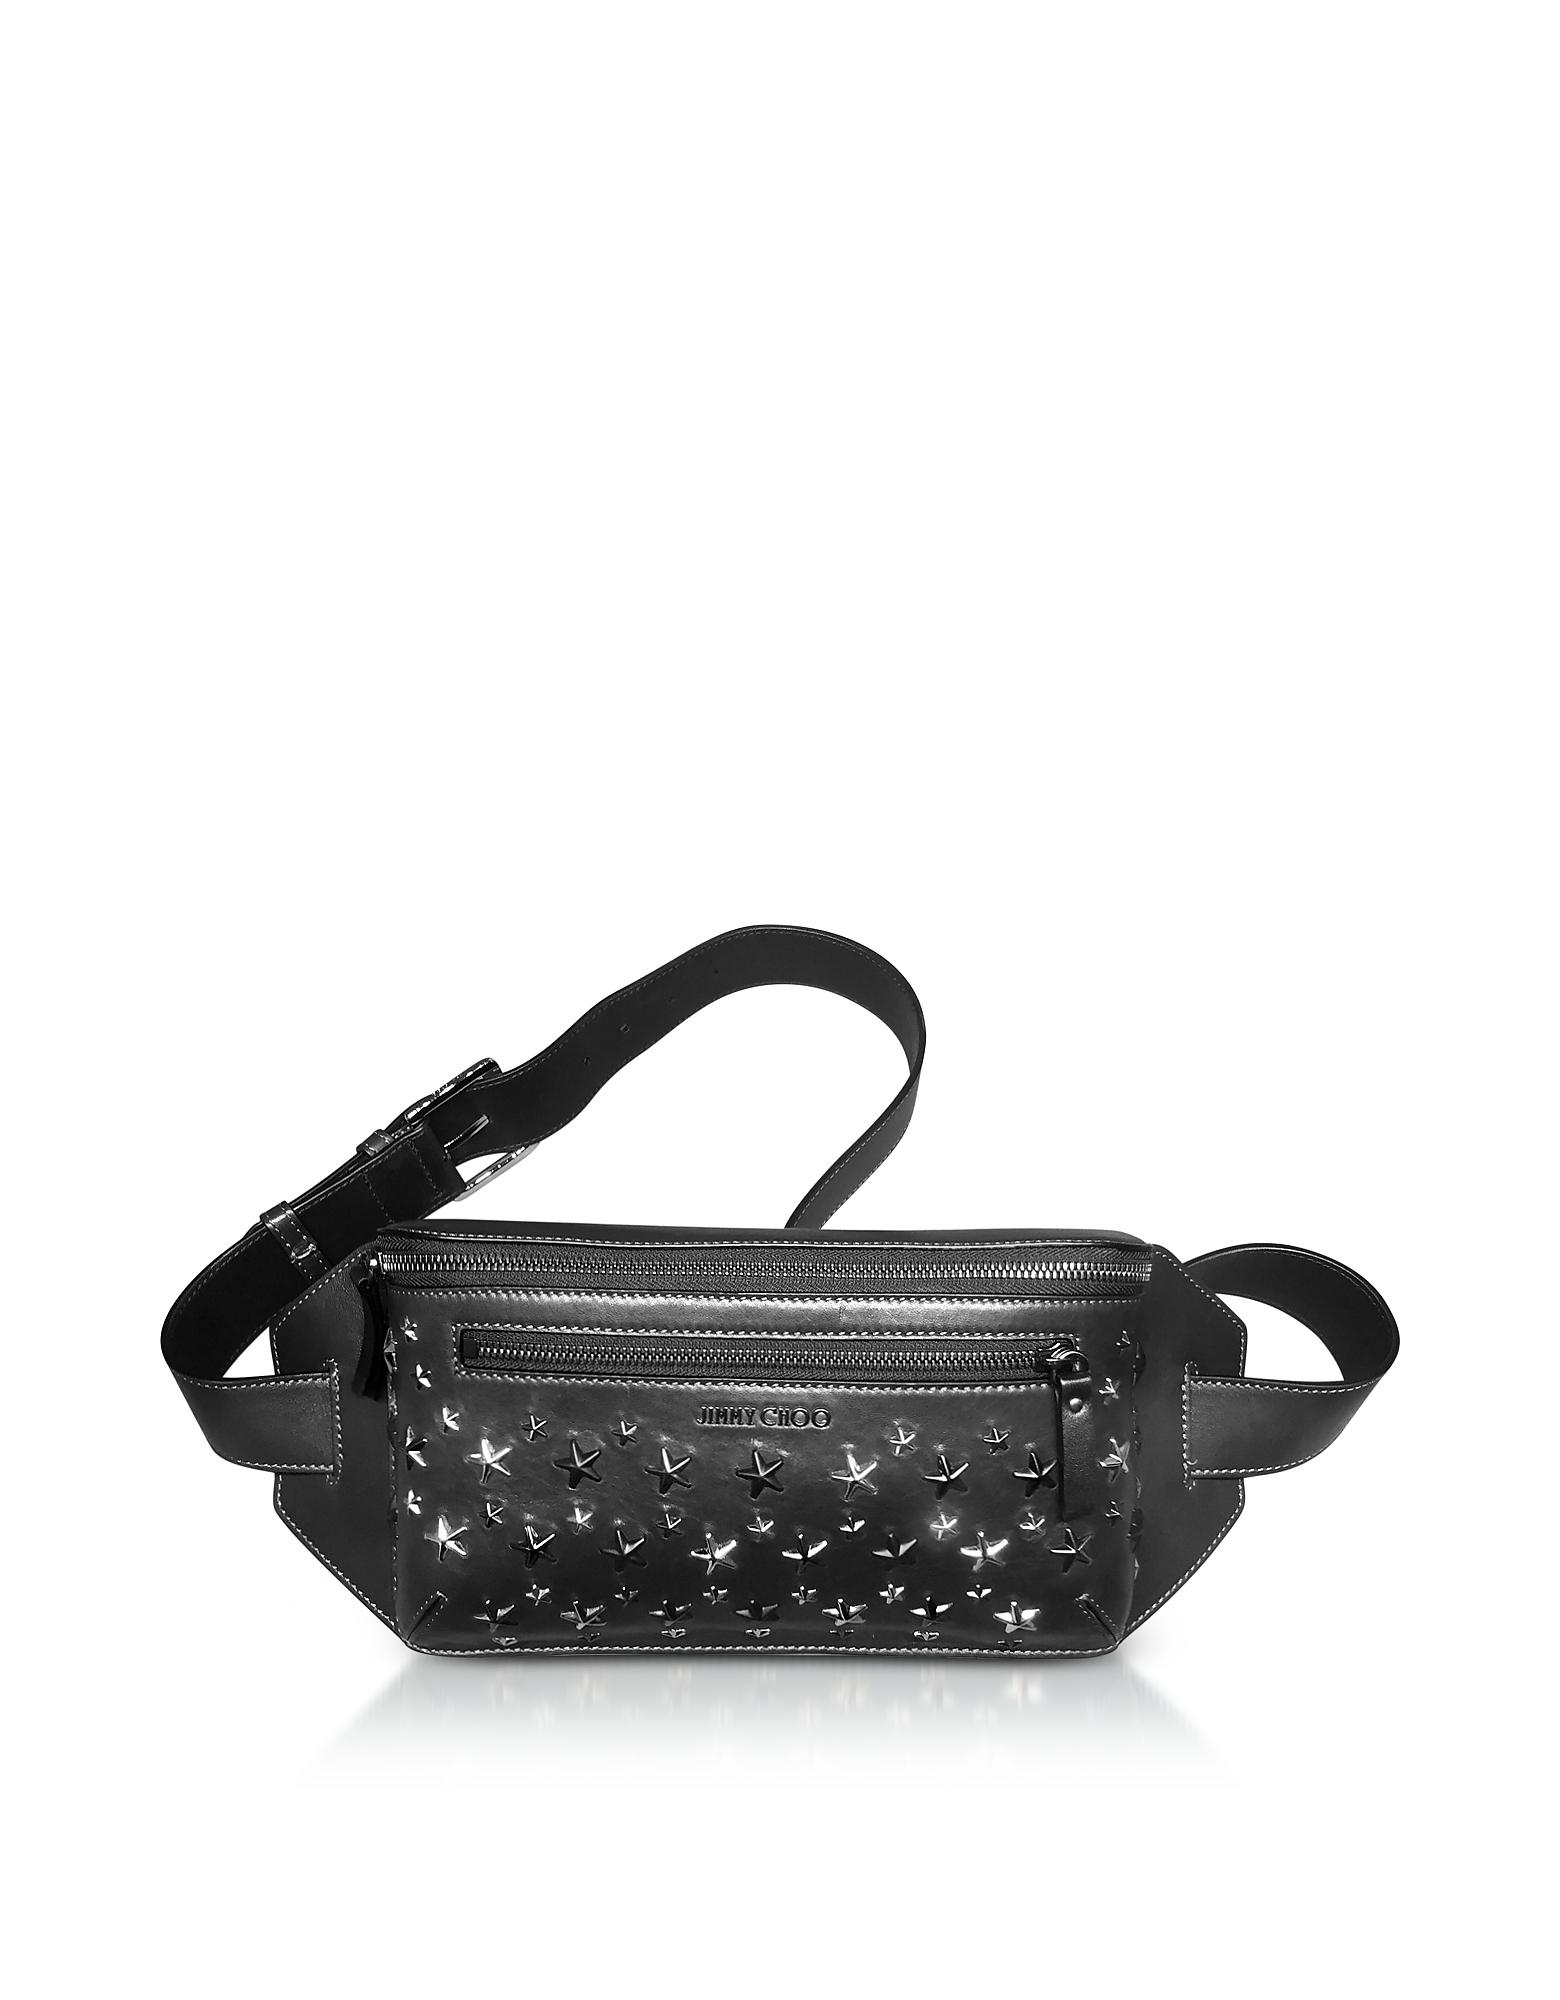 Jimmy Choo Handbags, Oscar Black Grainy Leather Belt Bag w/Embossed Stars